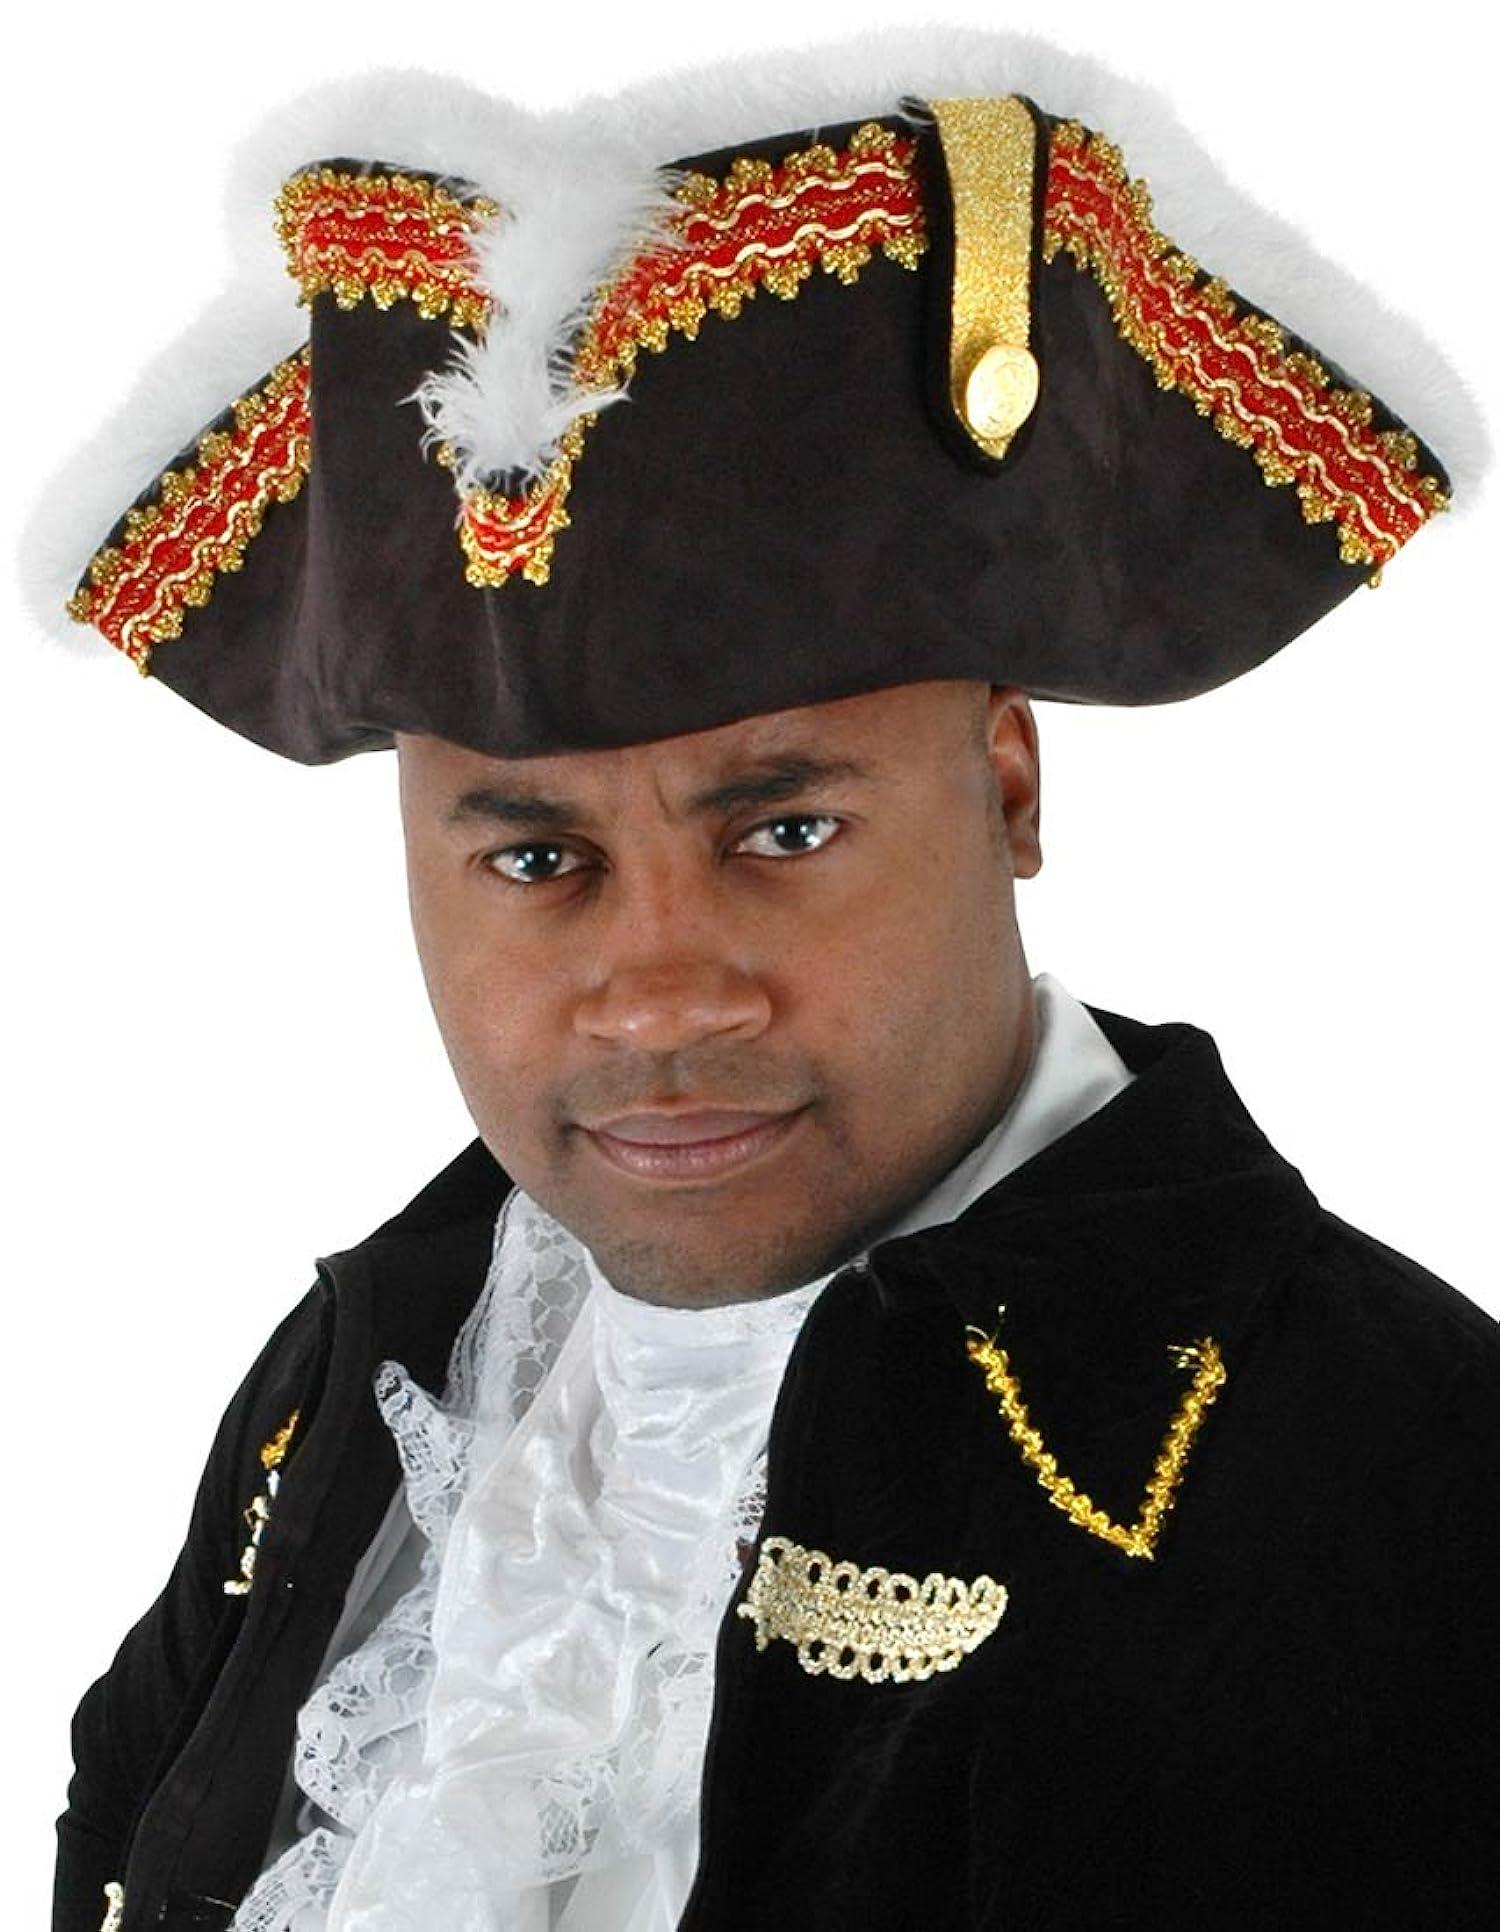 Men's British Captain Tricorn Hat - DeluxeAdultCostumes.com